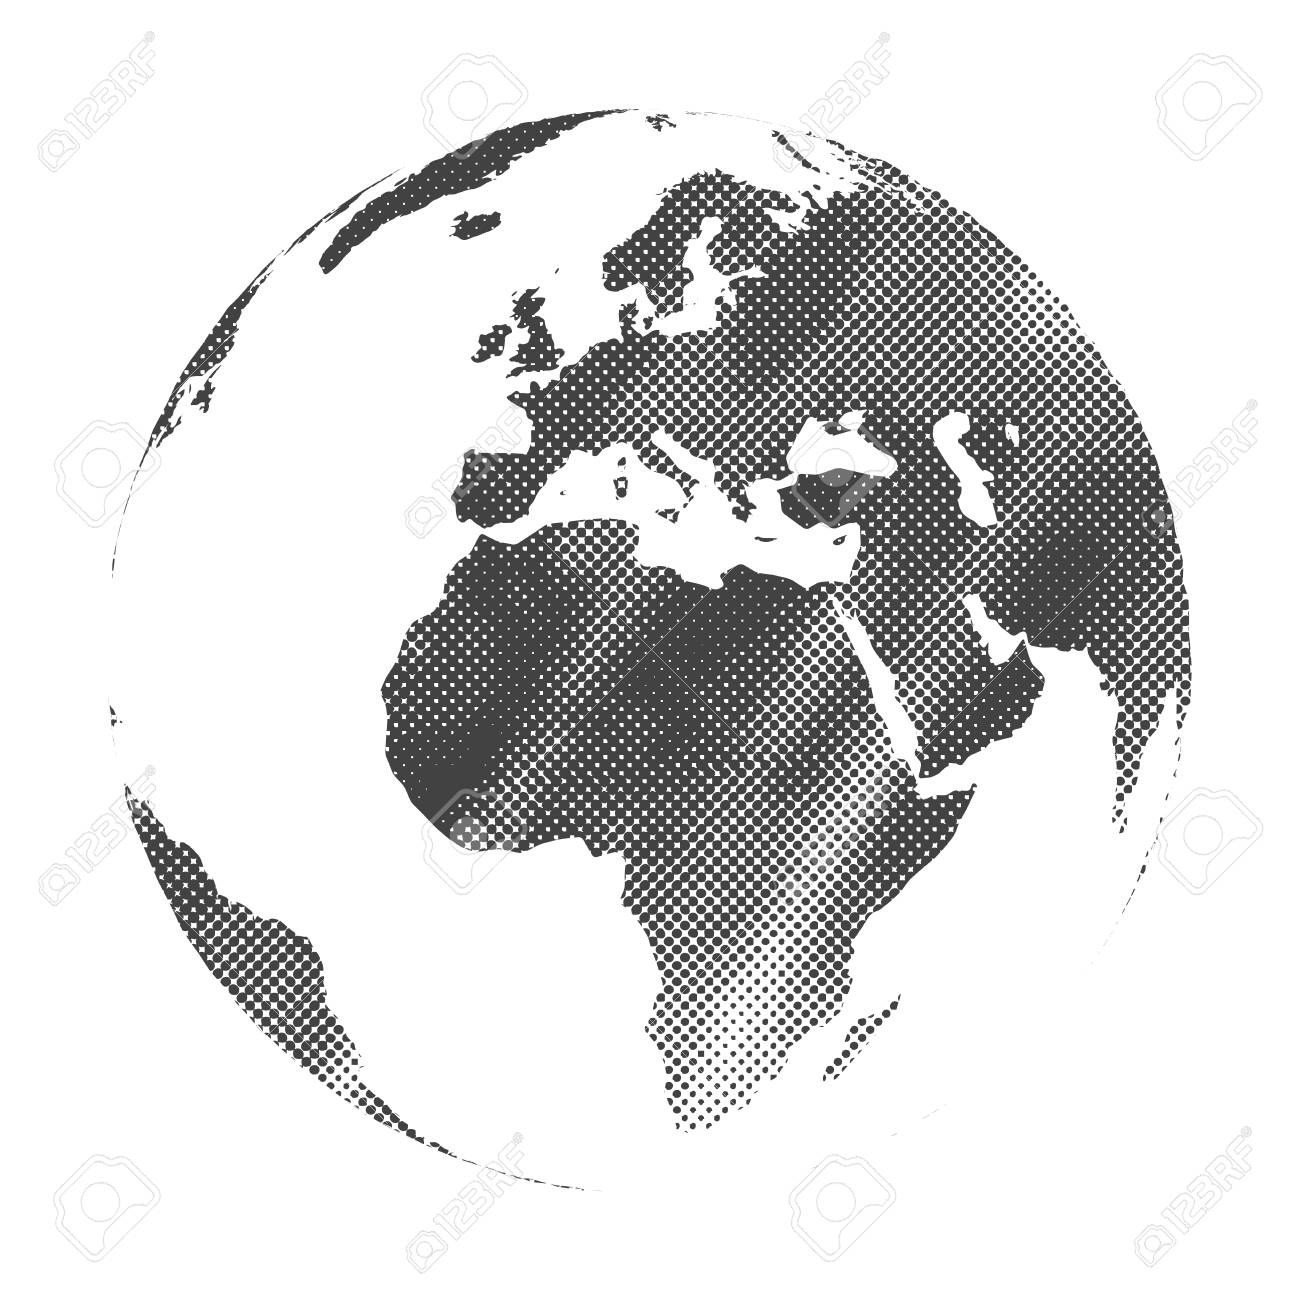 Grunge halftone texture gray world map globe vector illustration grunge halftone texture gray world map globe vector illustration stock vector 78493728 gumiabroncs Gallery